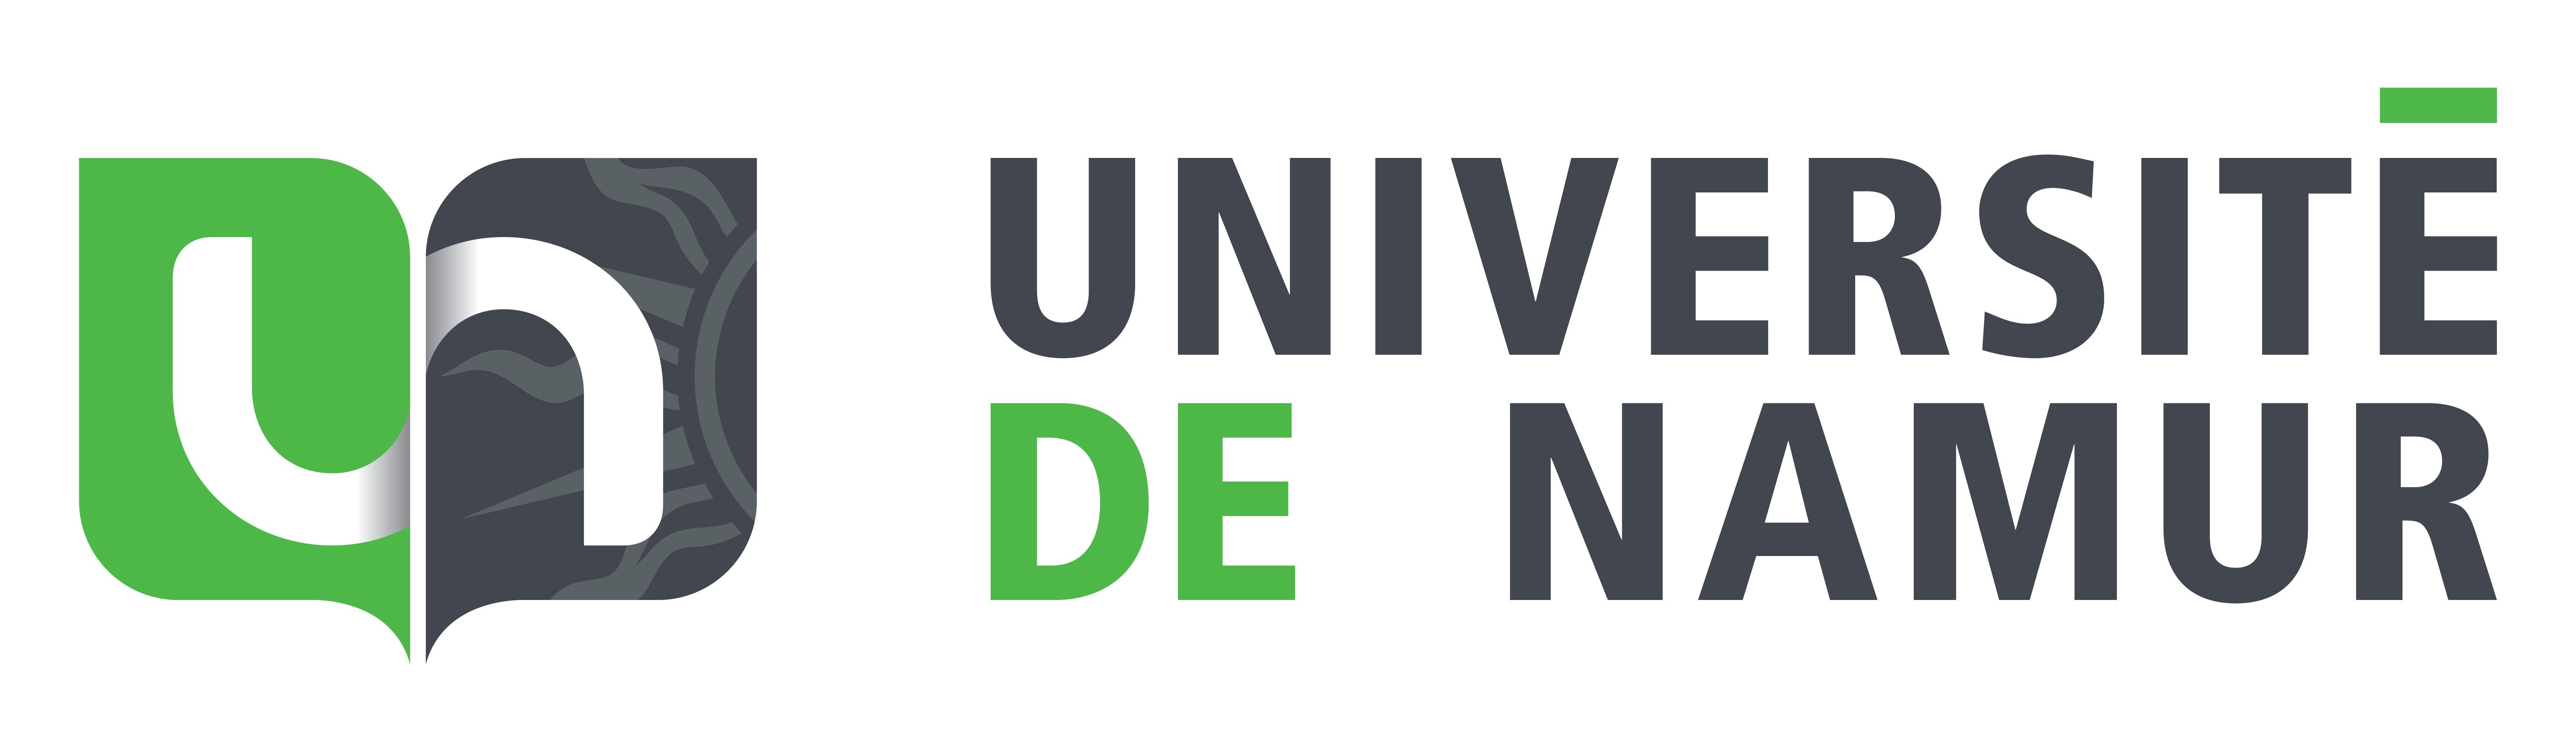 https://cdn.uclouvain.be/groups/cms-editors-isba/arc-imal-20-25/logos-/logo_Namur.jpg?itok=gZ2uTuHo